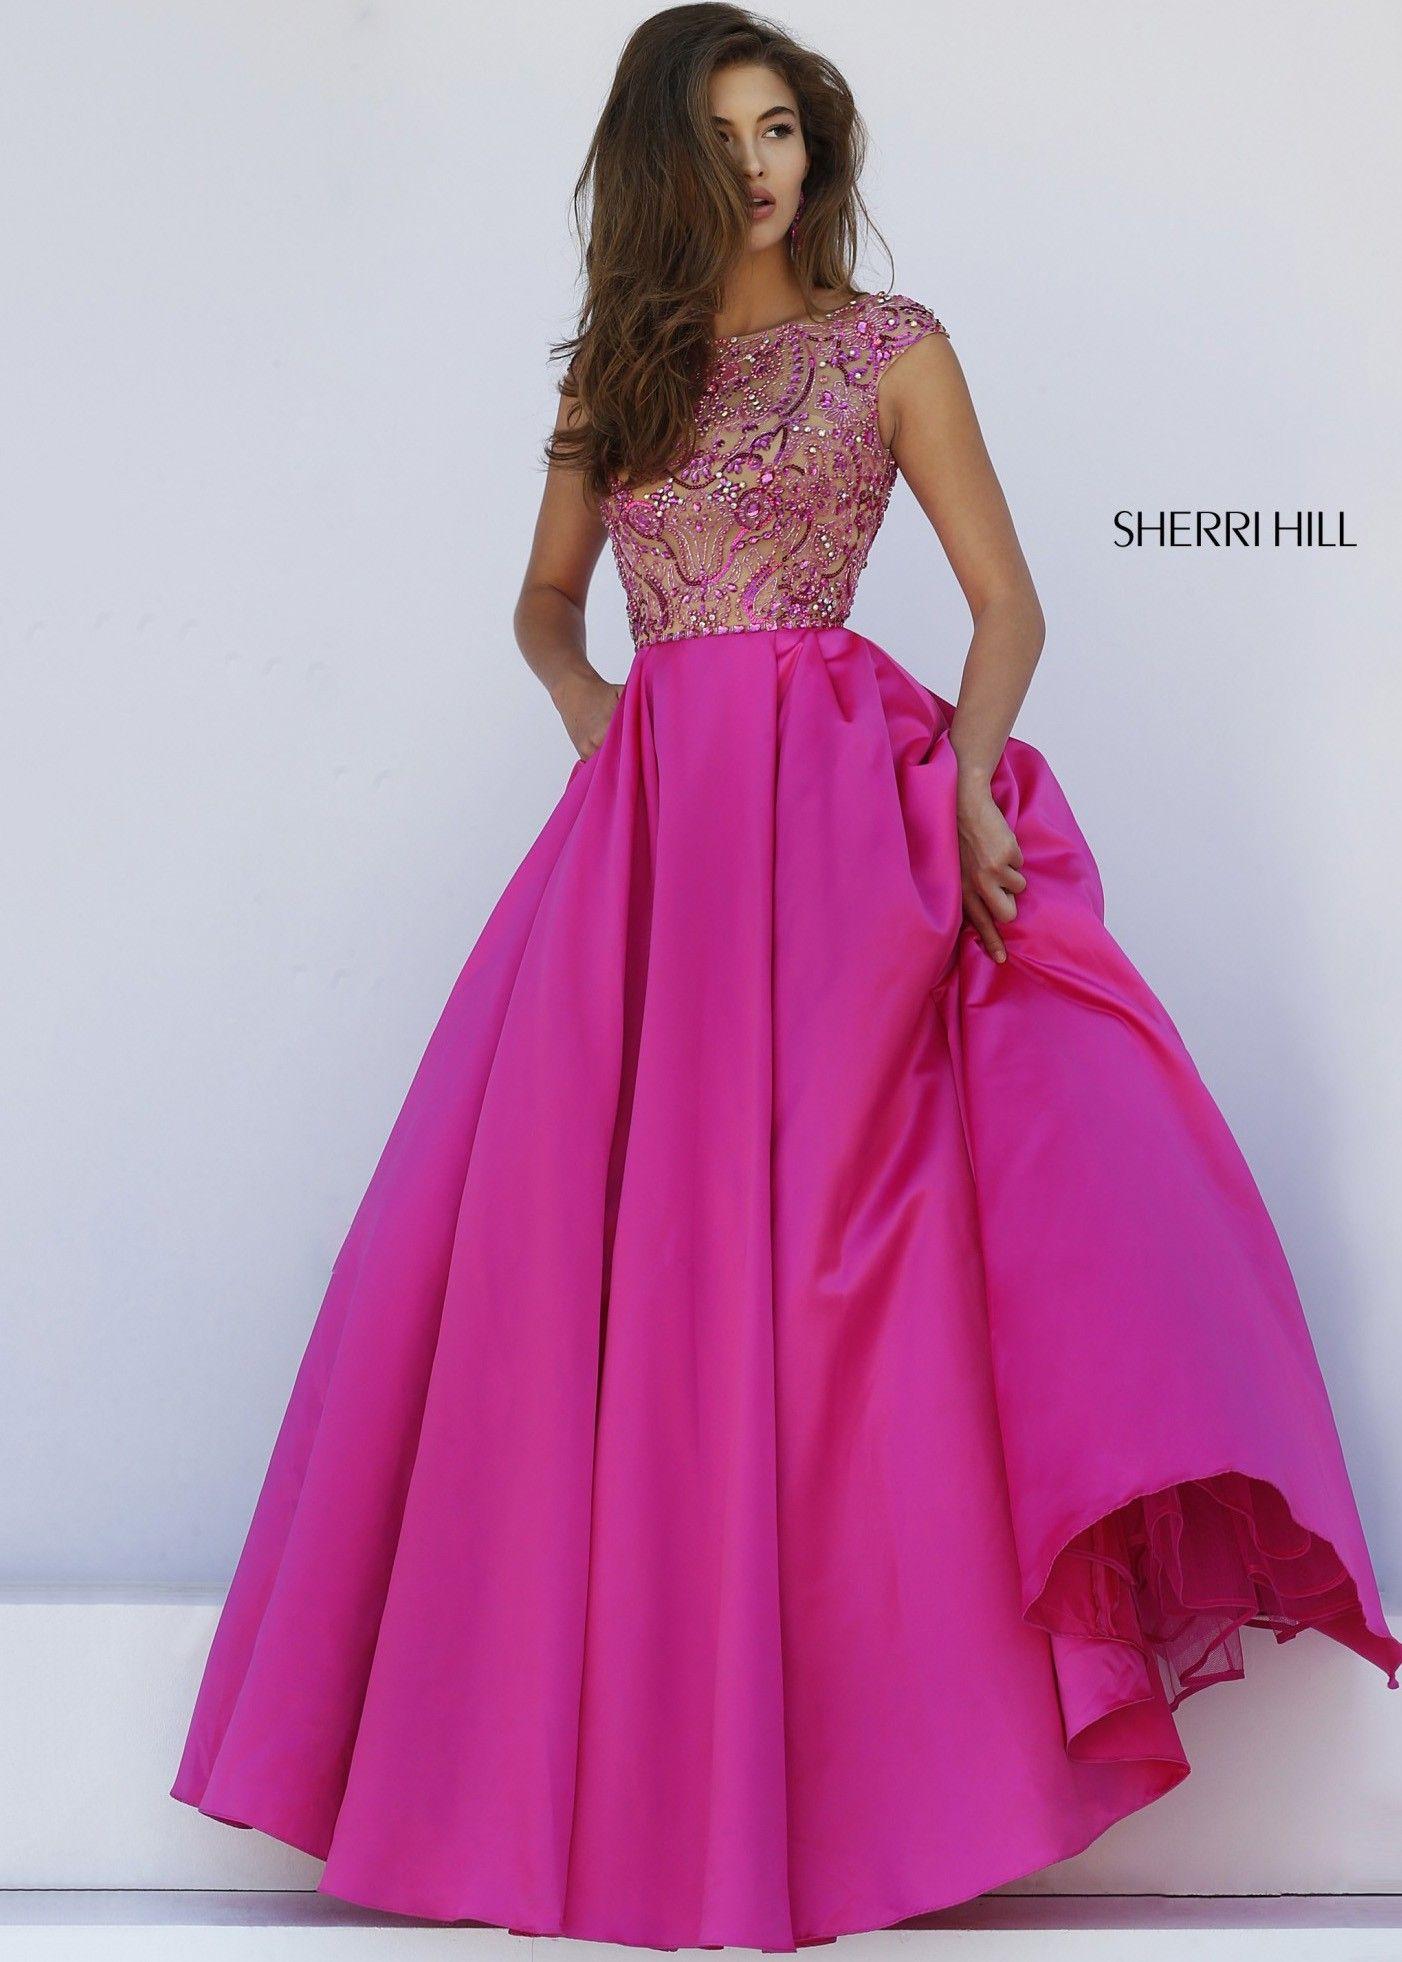 Sherri Hill 32359 Vibrant Cap Sleeve Evening Gown   Pinterest   Cap ...